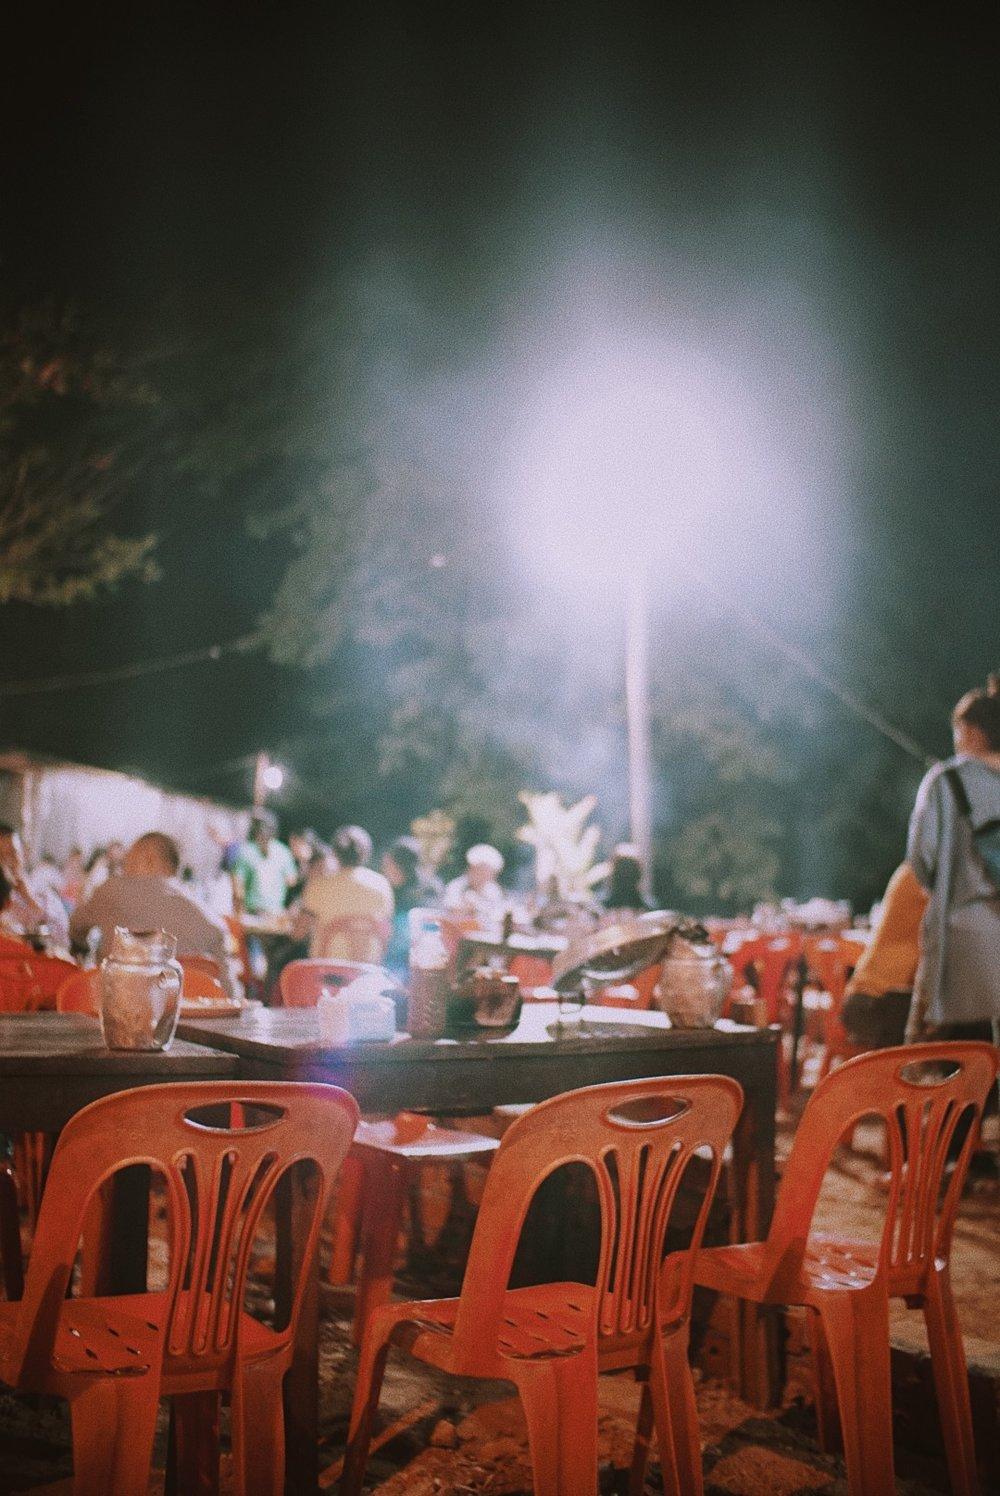 "Sepanjang Khem Khong road, di pinggir Sungai Mekong, ada banyak restoran ""all you can eat"" model suki barbecue gini. Biasanya sekitar IDR 150.000-300.000 per orang untuk makan sepuasnya dengan menu komplit dari daging, ikan, sayur dan buah-buahan."